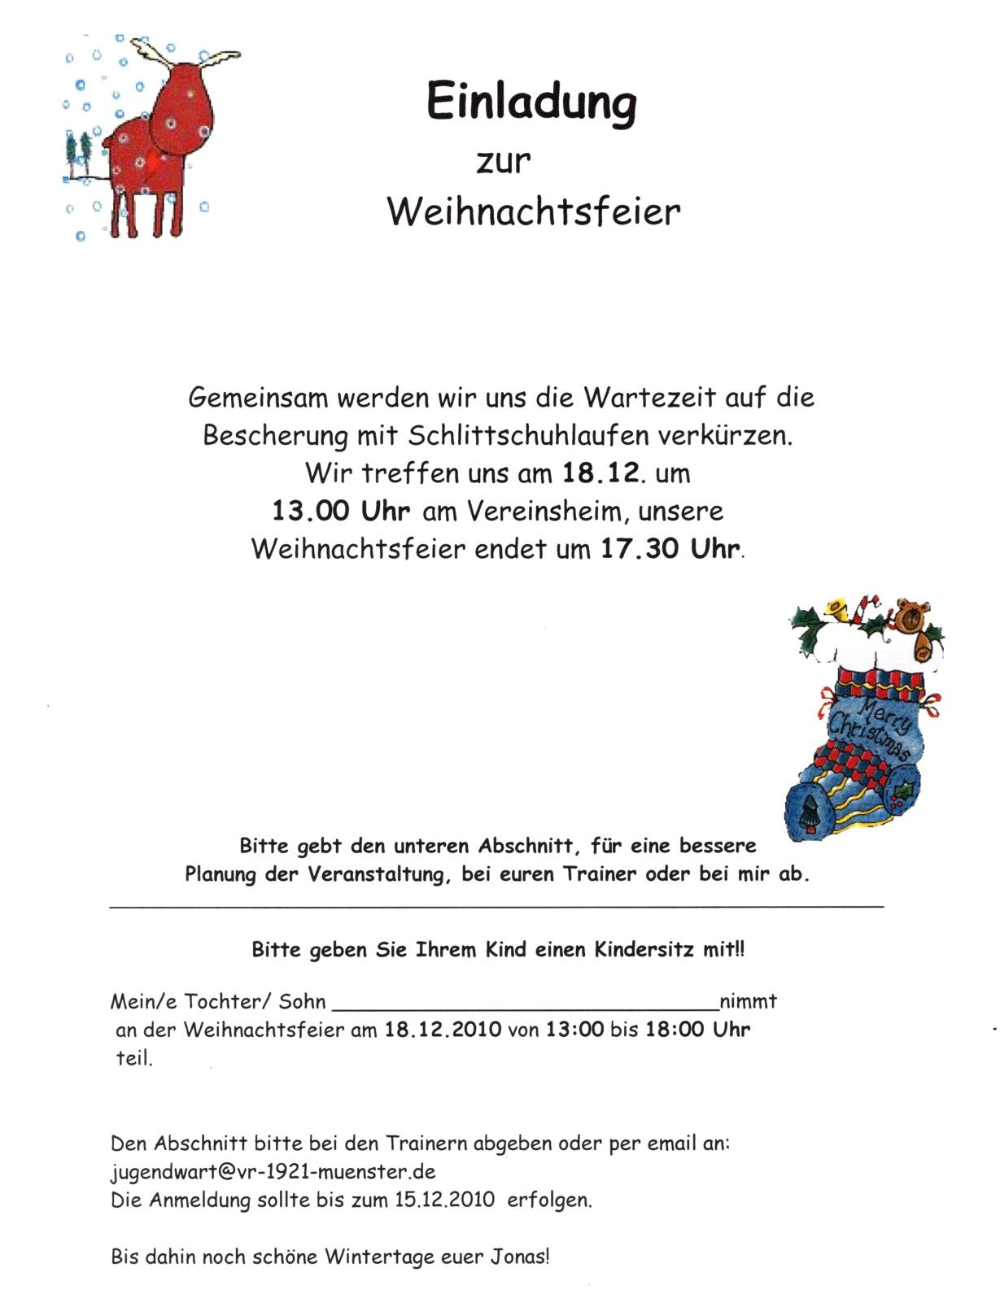 Einladung Weihnachtsfeier Arbeit Christmas Party Invitations Invitation Template Invitations